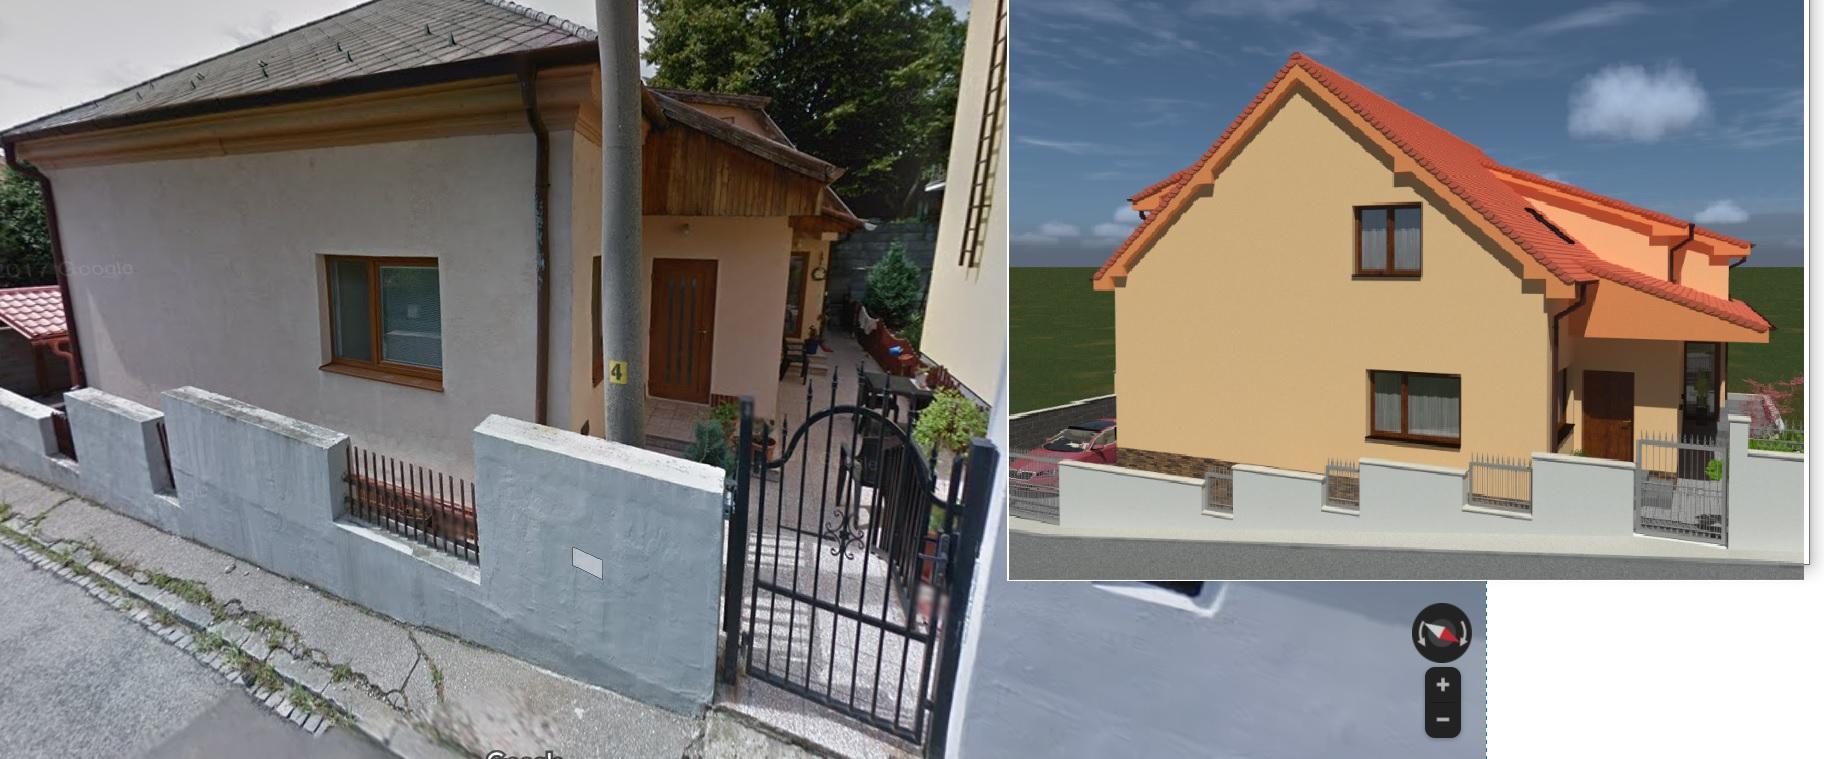 Prestavba podkrovia zo sedlovo valbovej na sedlovú strechu. - Obrázok č. 13